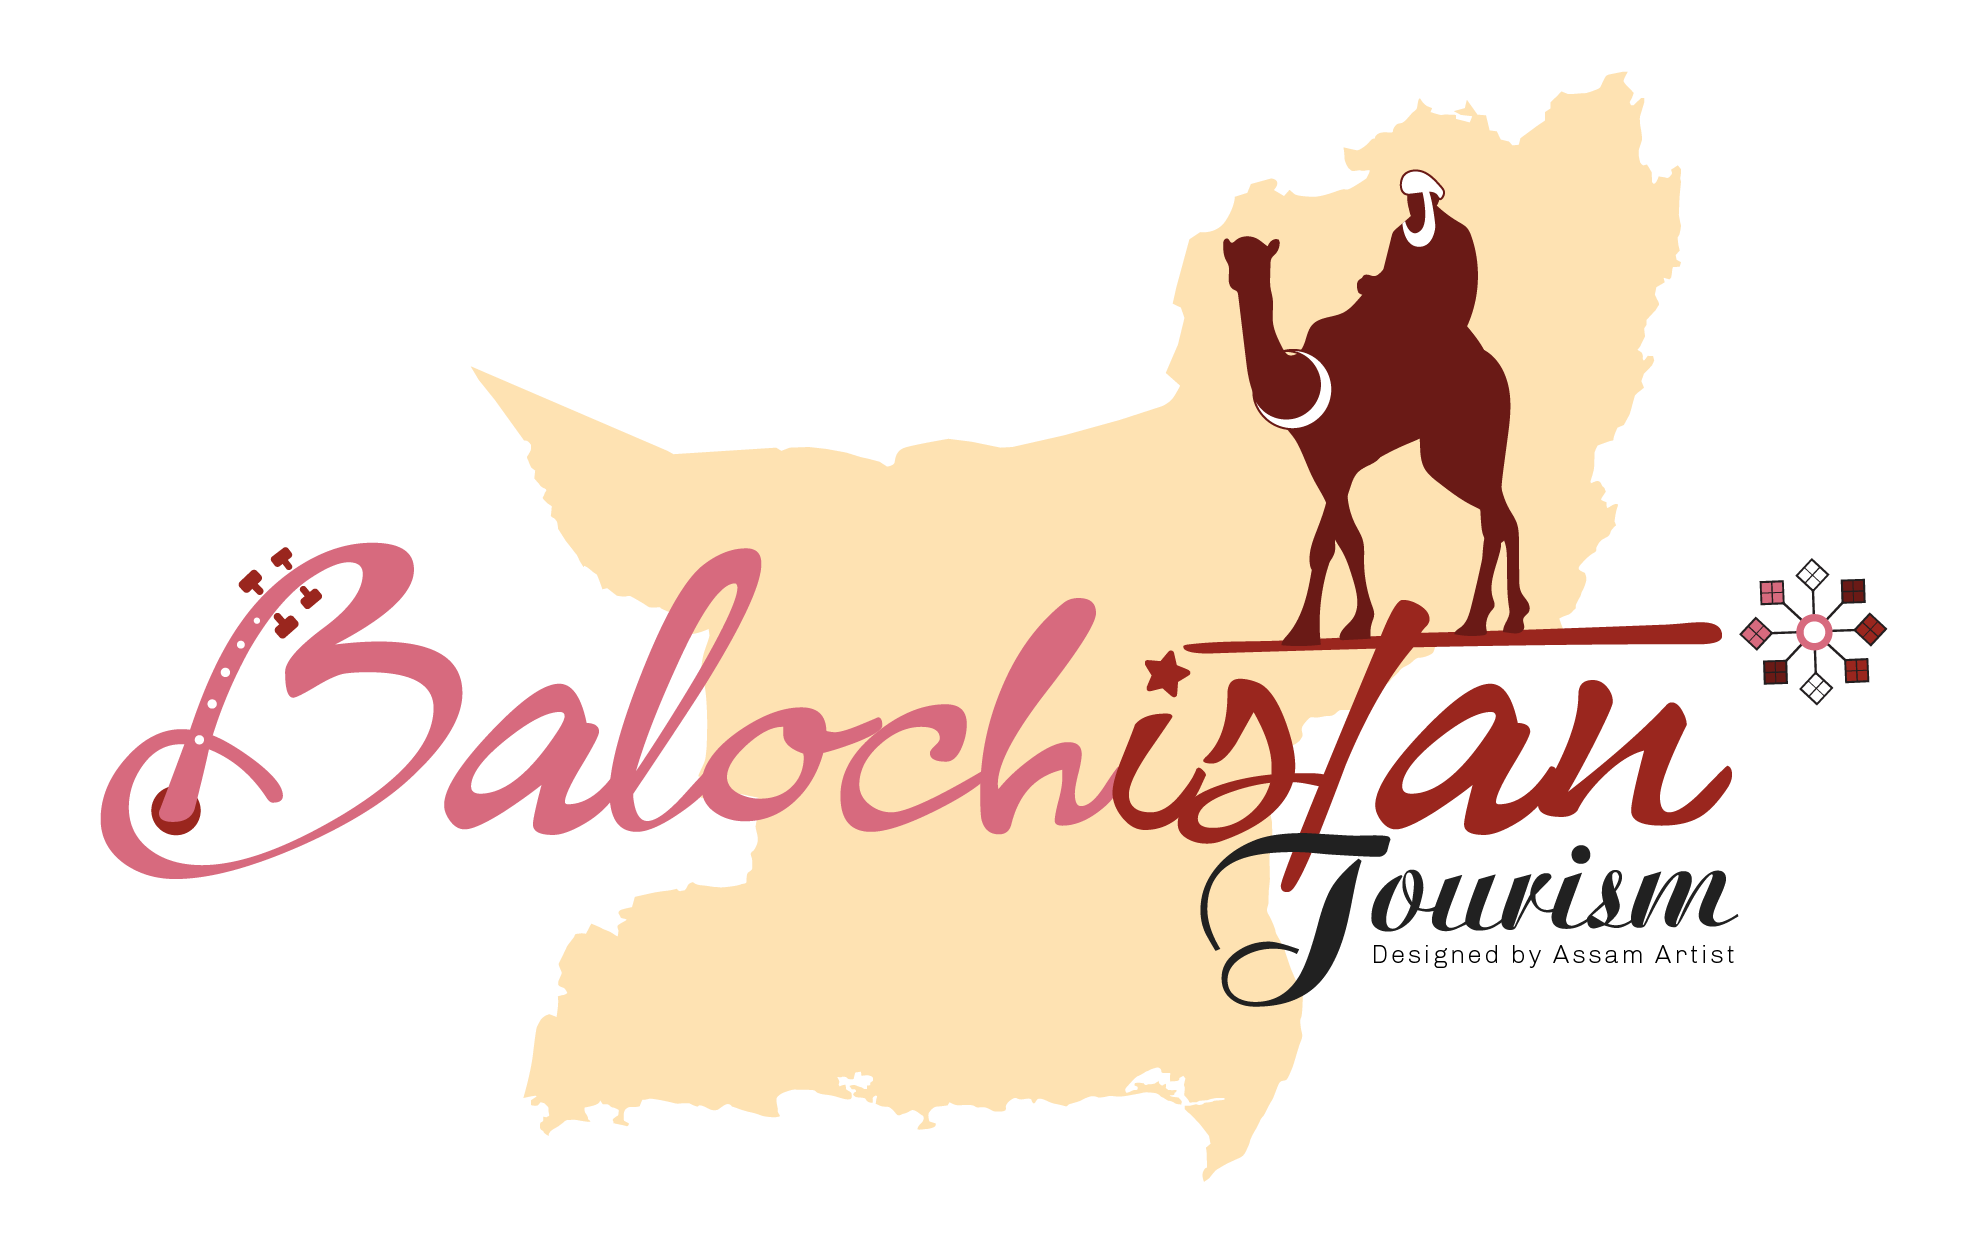 Balochistan tourism logo vector high resolution download